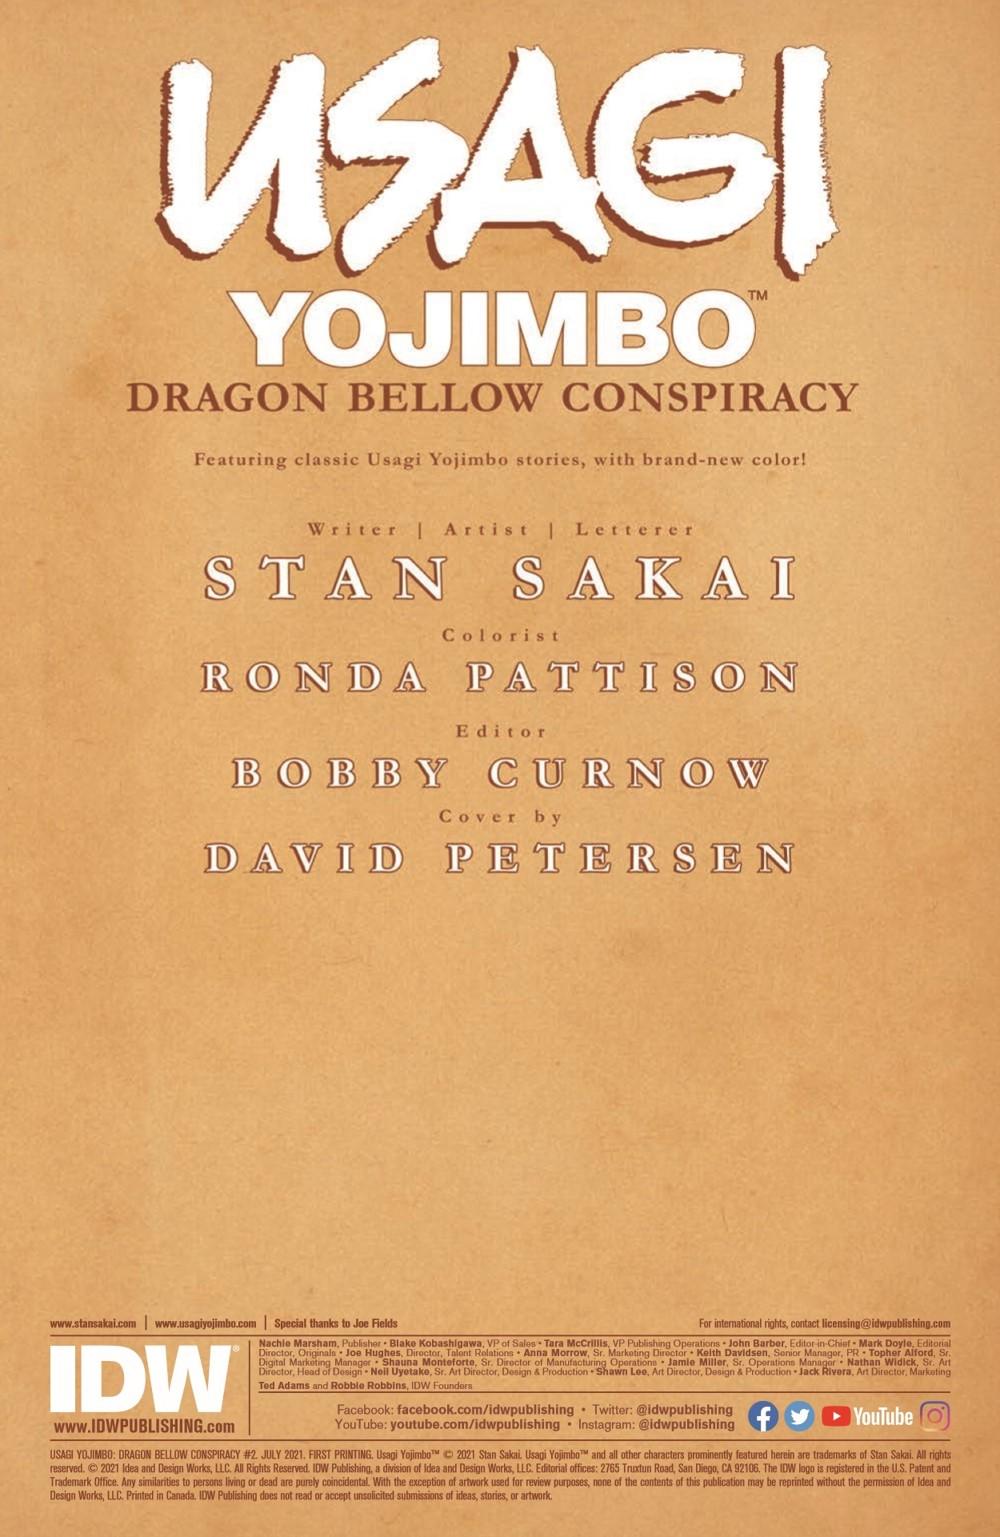 Usagi-DBC02_pr-2 ComicList Previews: USAGI YOJIMBO THE DRAGON BELLOW CONSPIRACY #2 (OF 6)